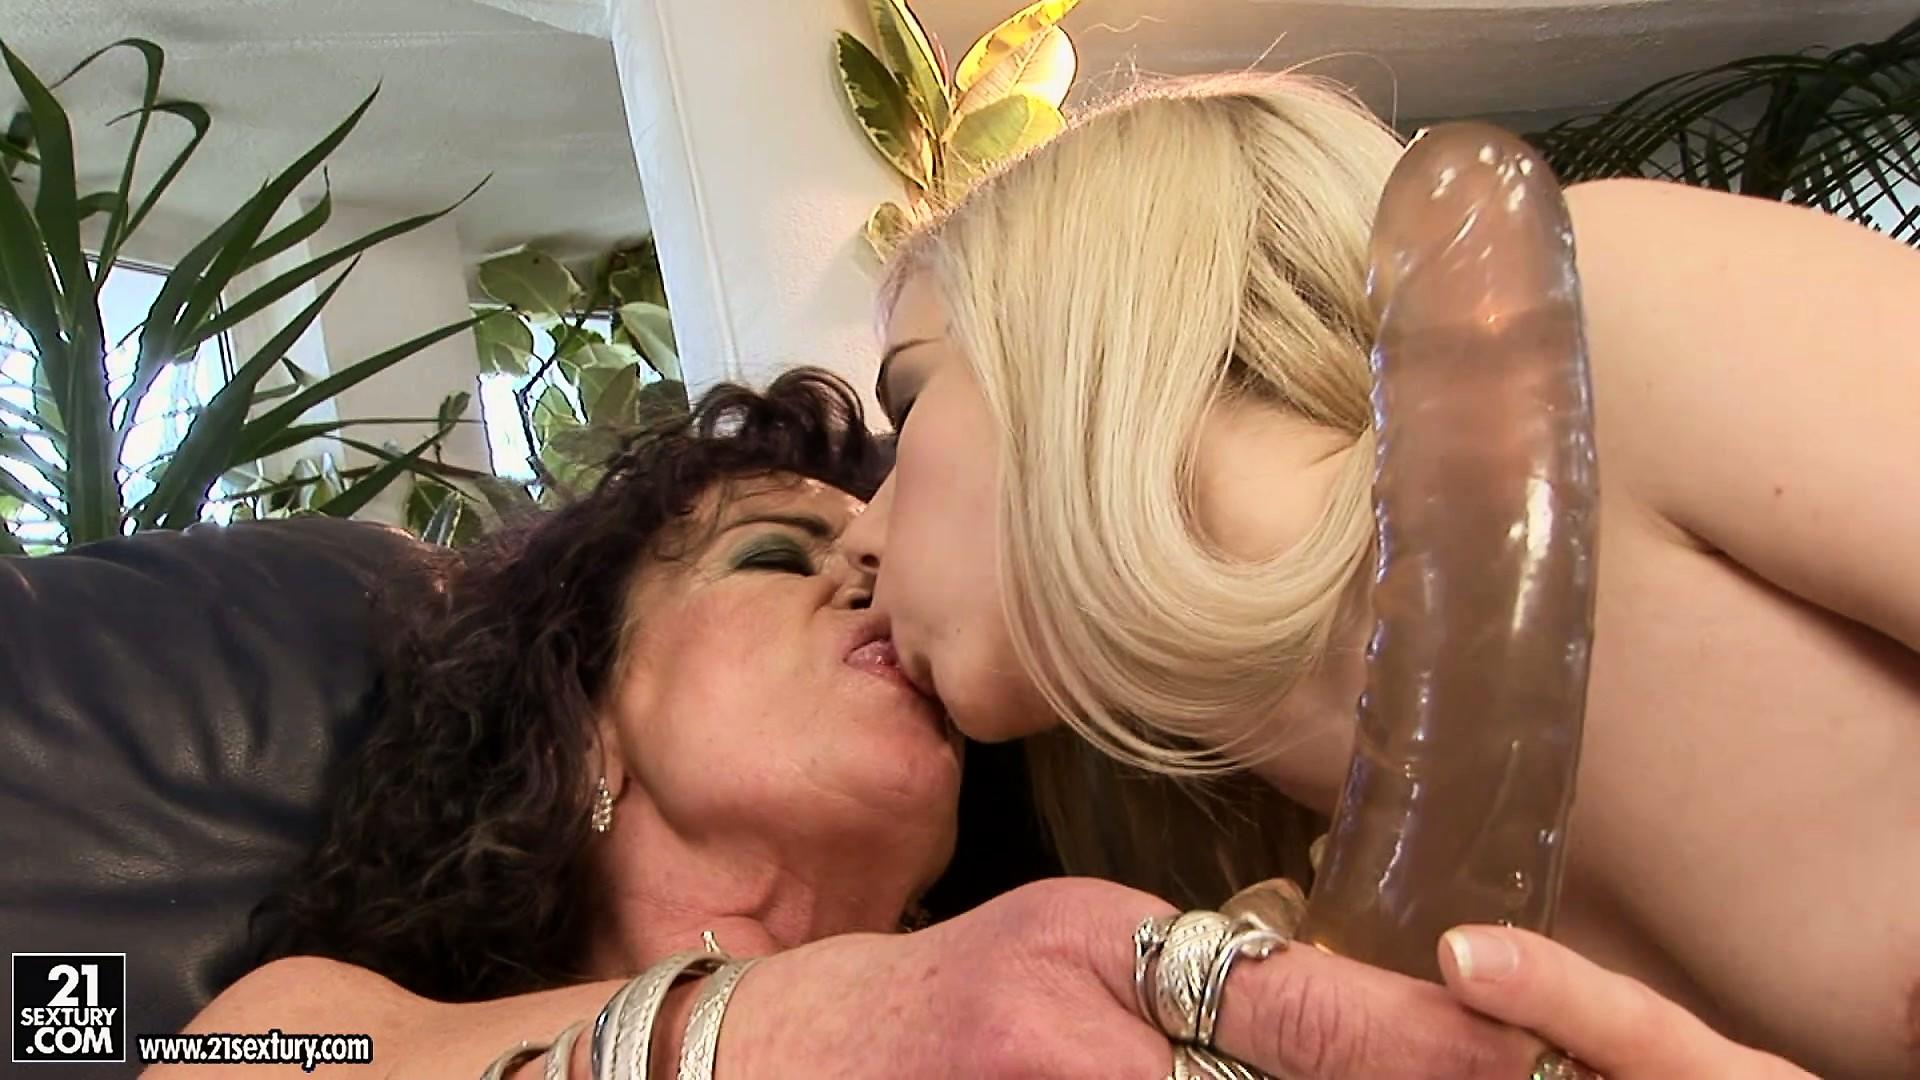 Nesty Hd Videos Porn free mobile porn & sex videos & sex movies - nasty nesty and